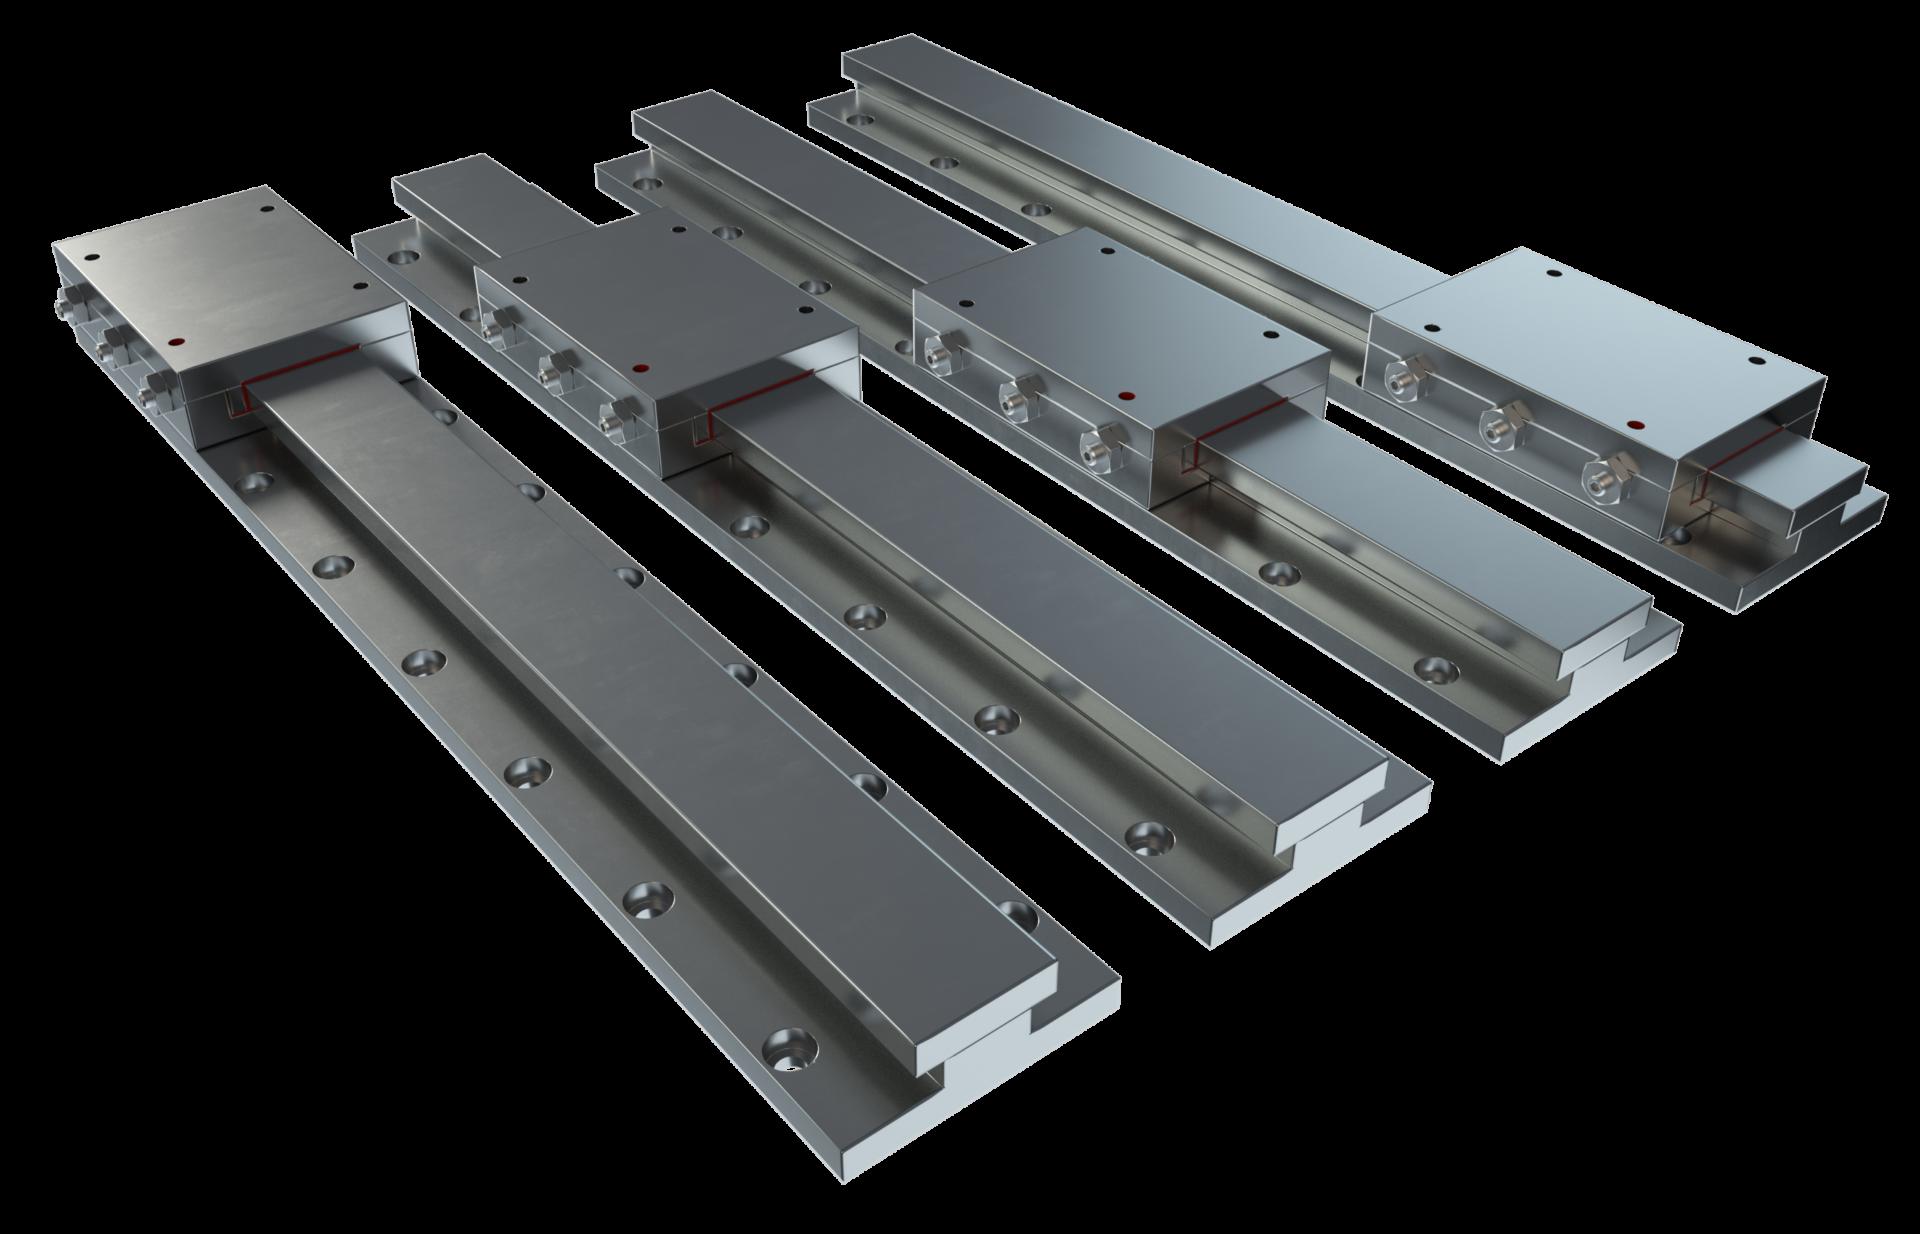 DuraBond Slides - Industrial Linear Slides